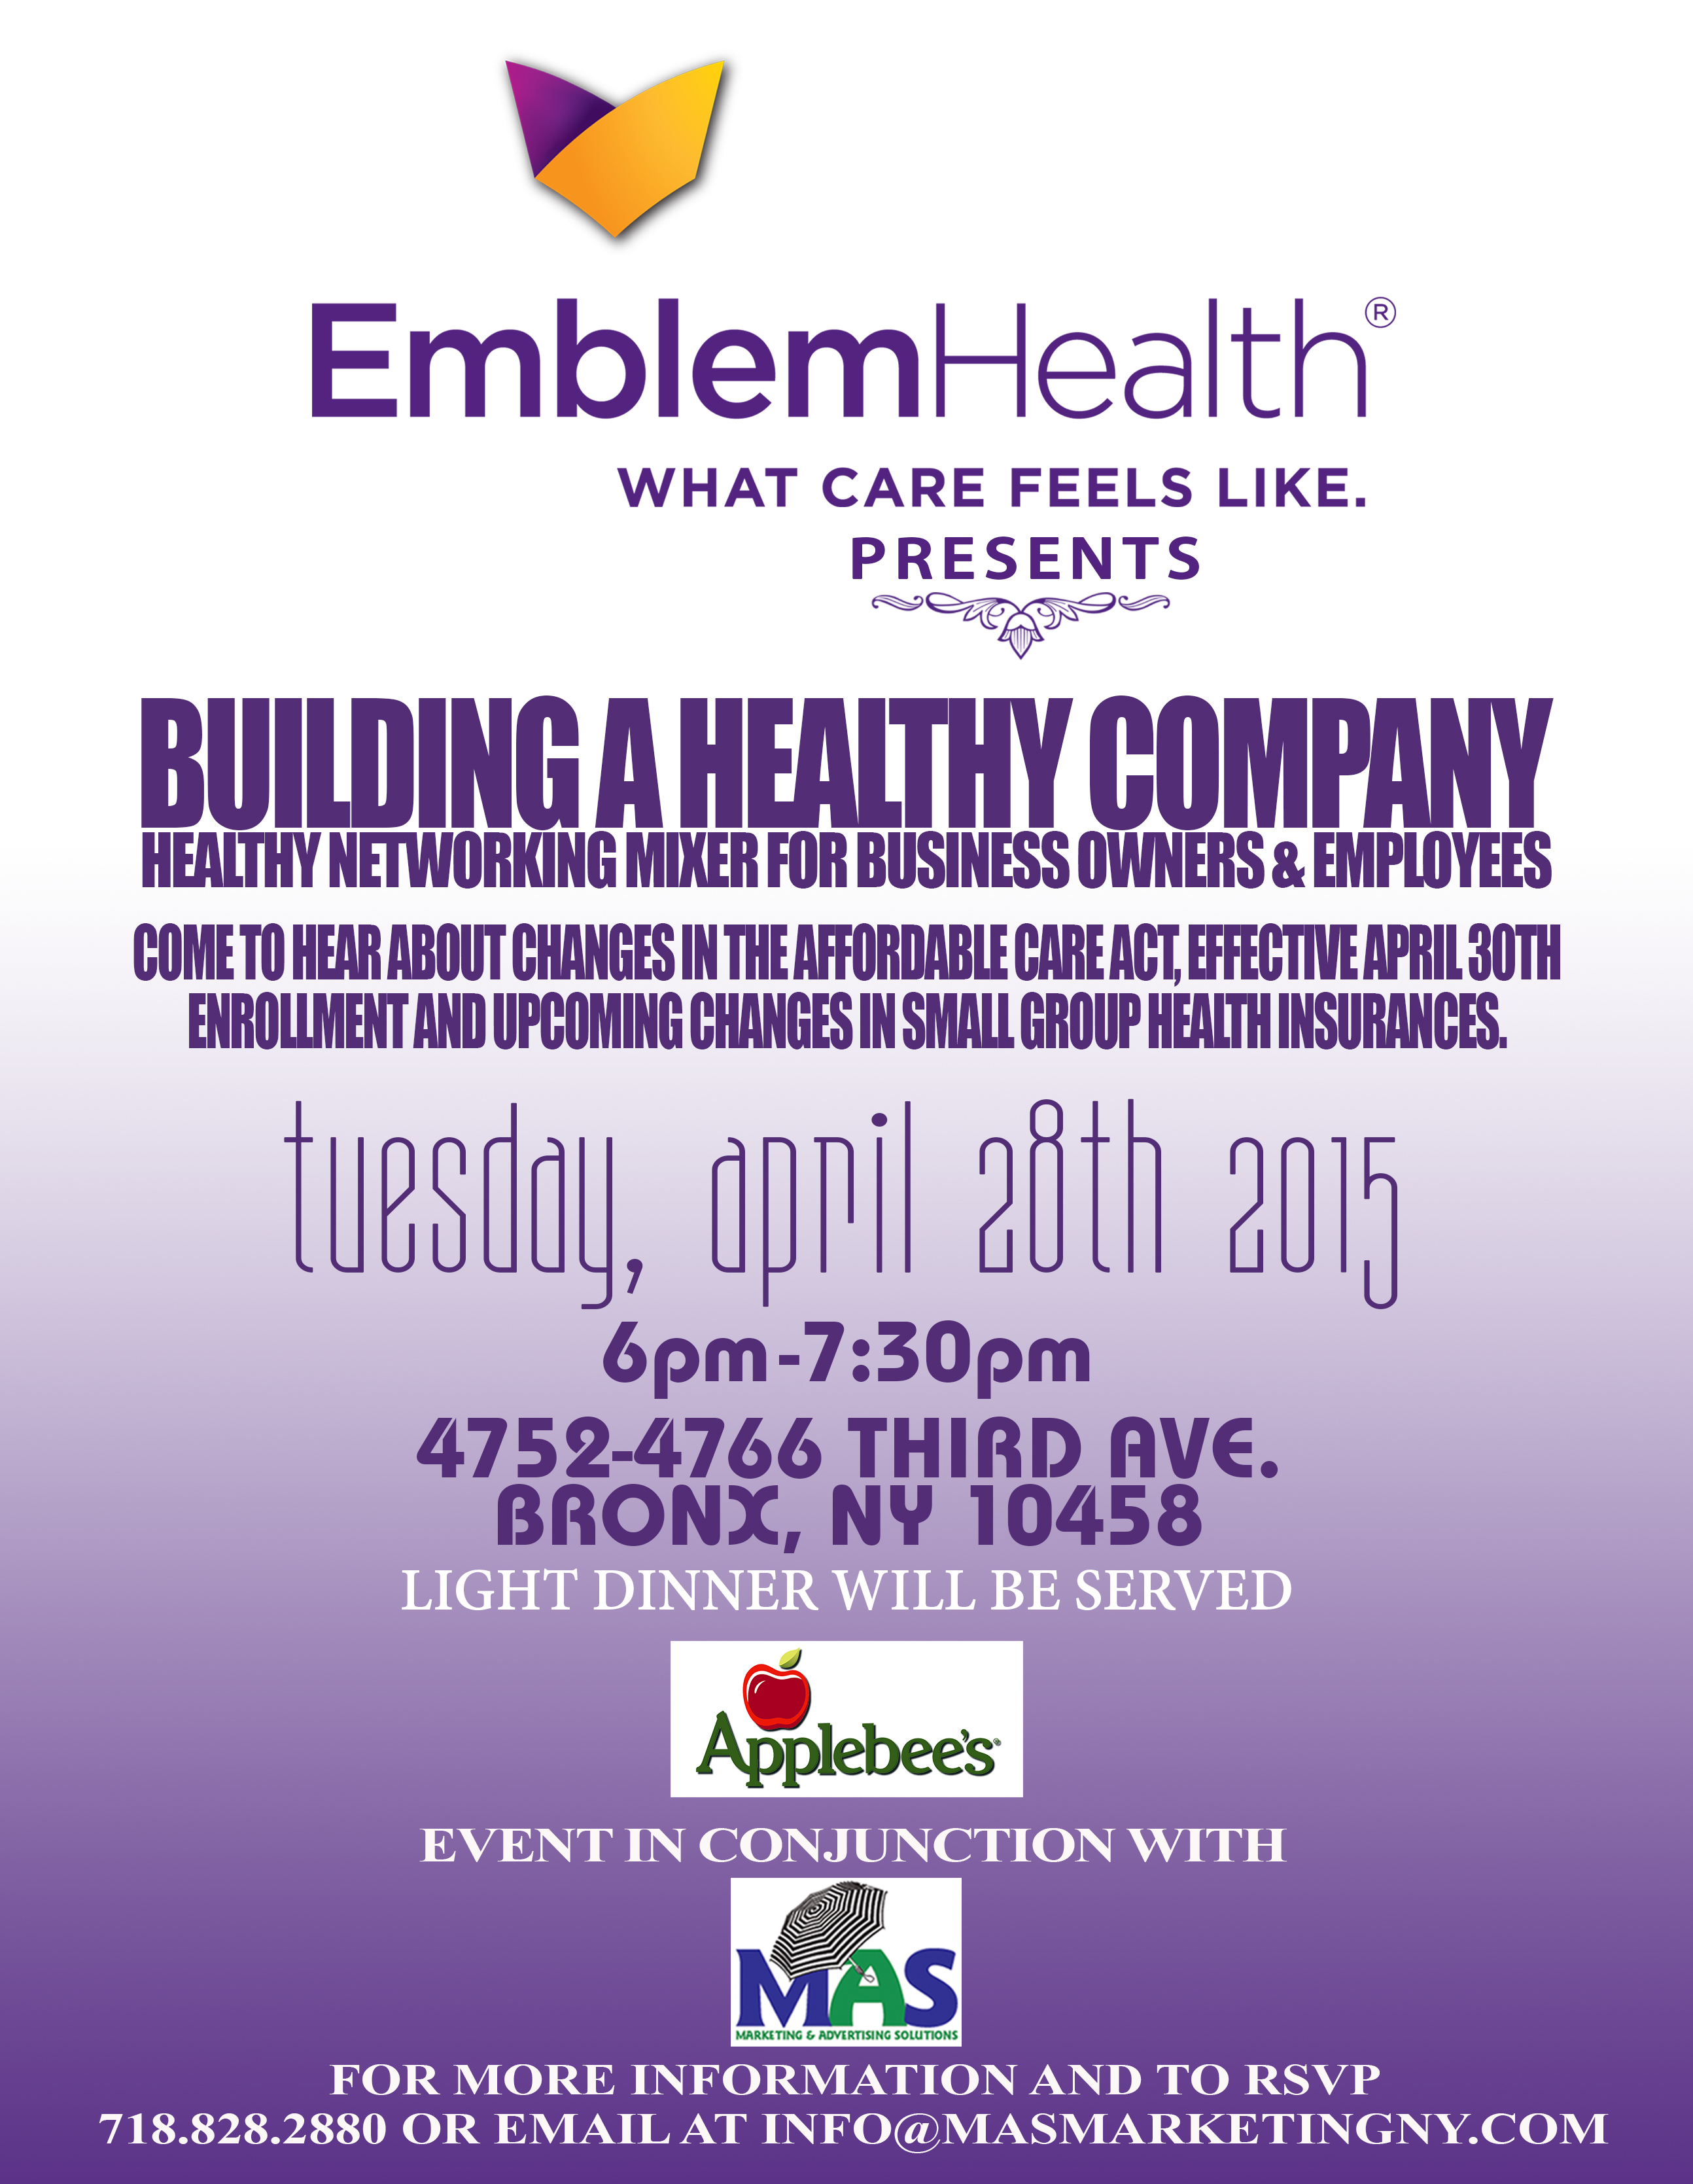 Building a Healthy Company April 28th, 6pm-7:30pm